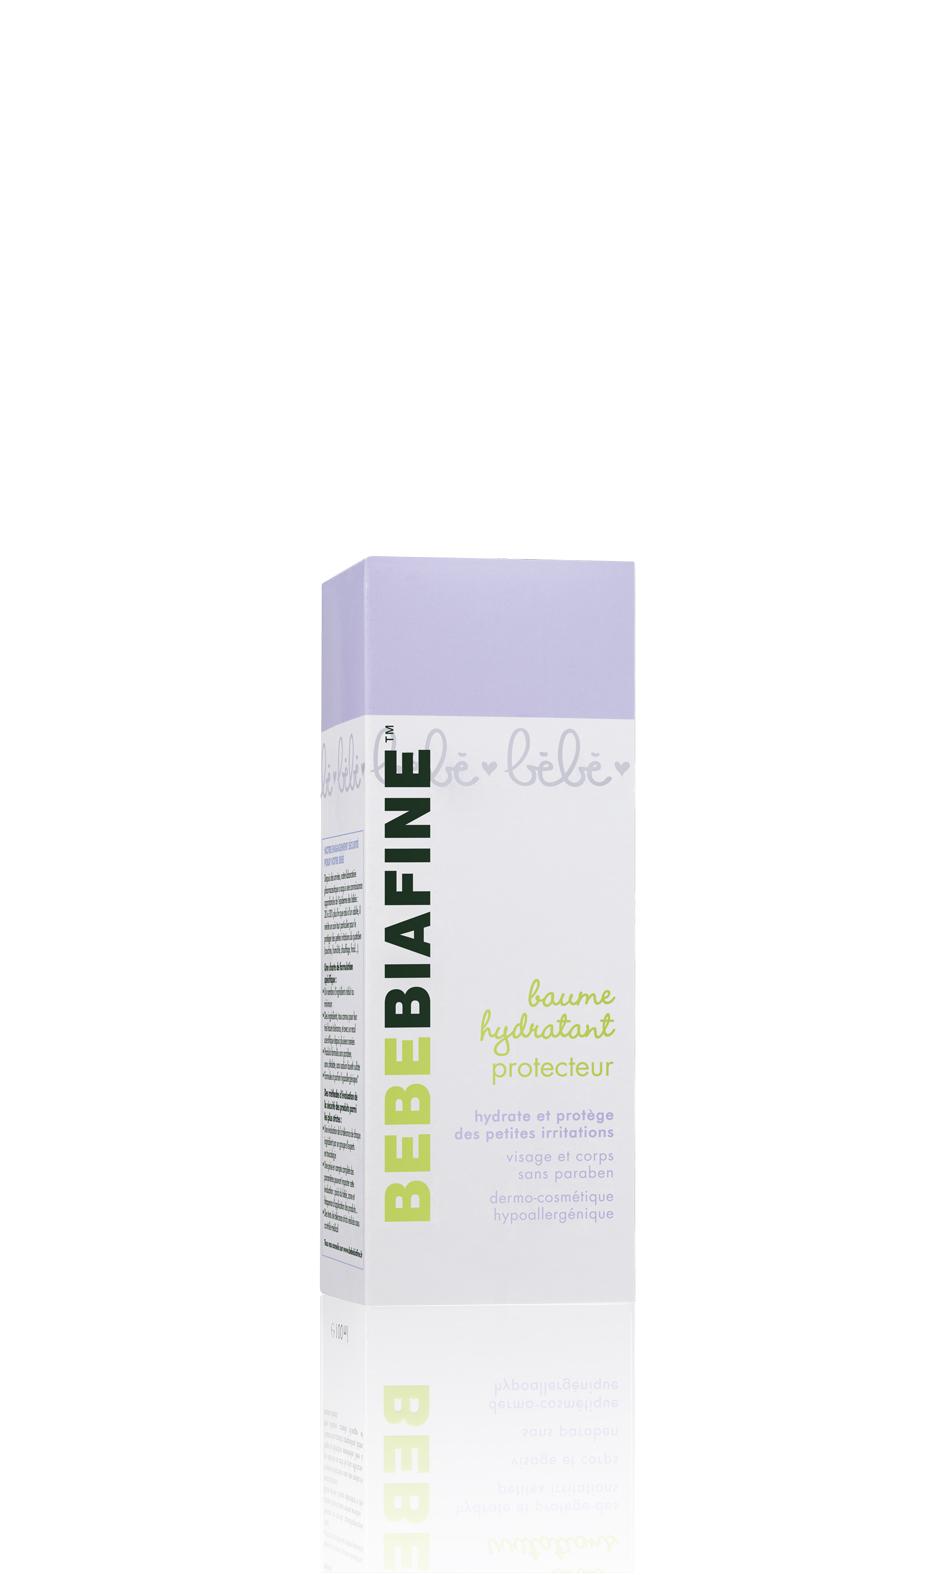 bebe c biafine baume hydratant protecteur tube 100ml. Black Bedroom Furniture Sets. Home Design Ideas